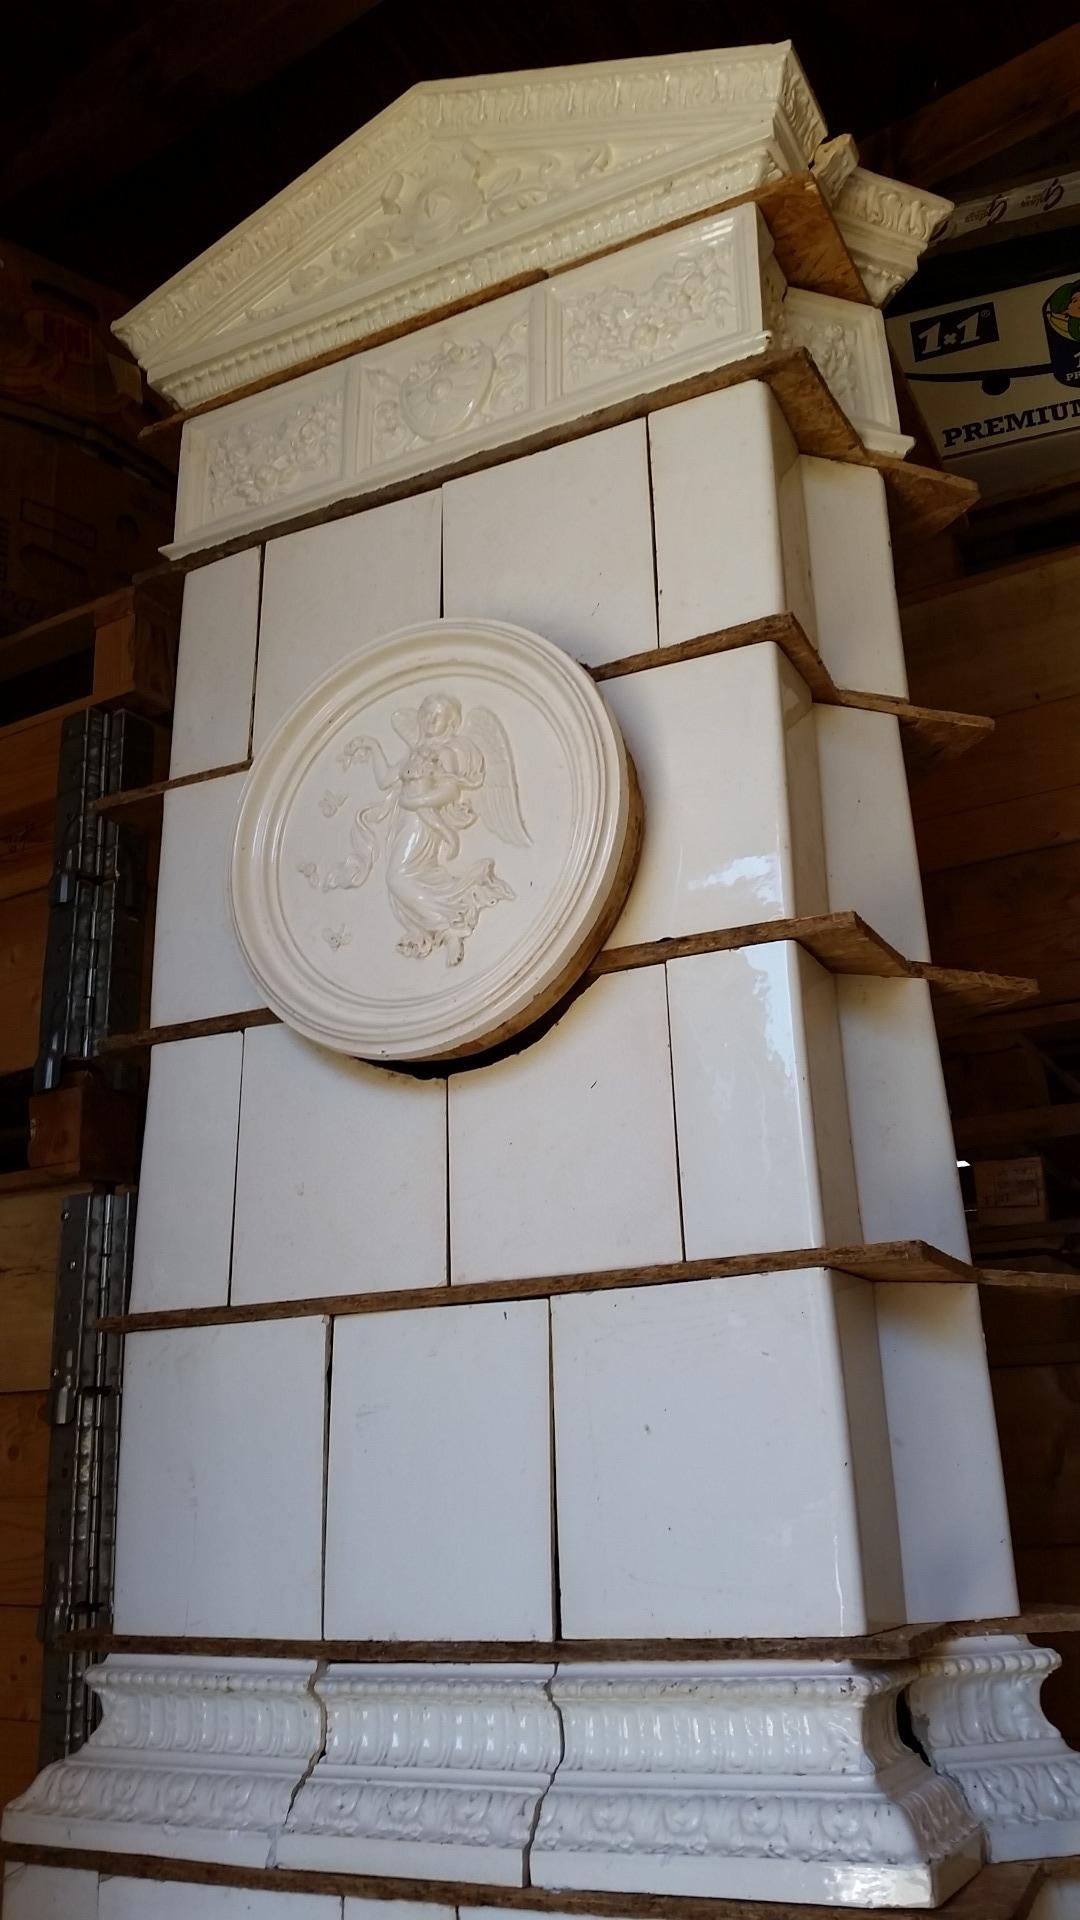 thumb4|Stufa antica bianca angolo, secolo 19, Hardmuth